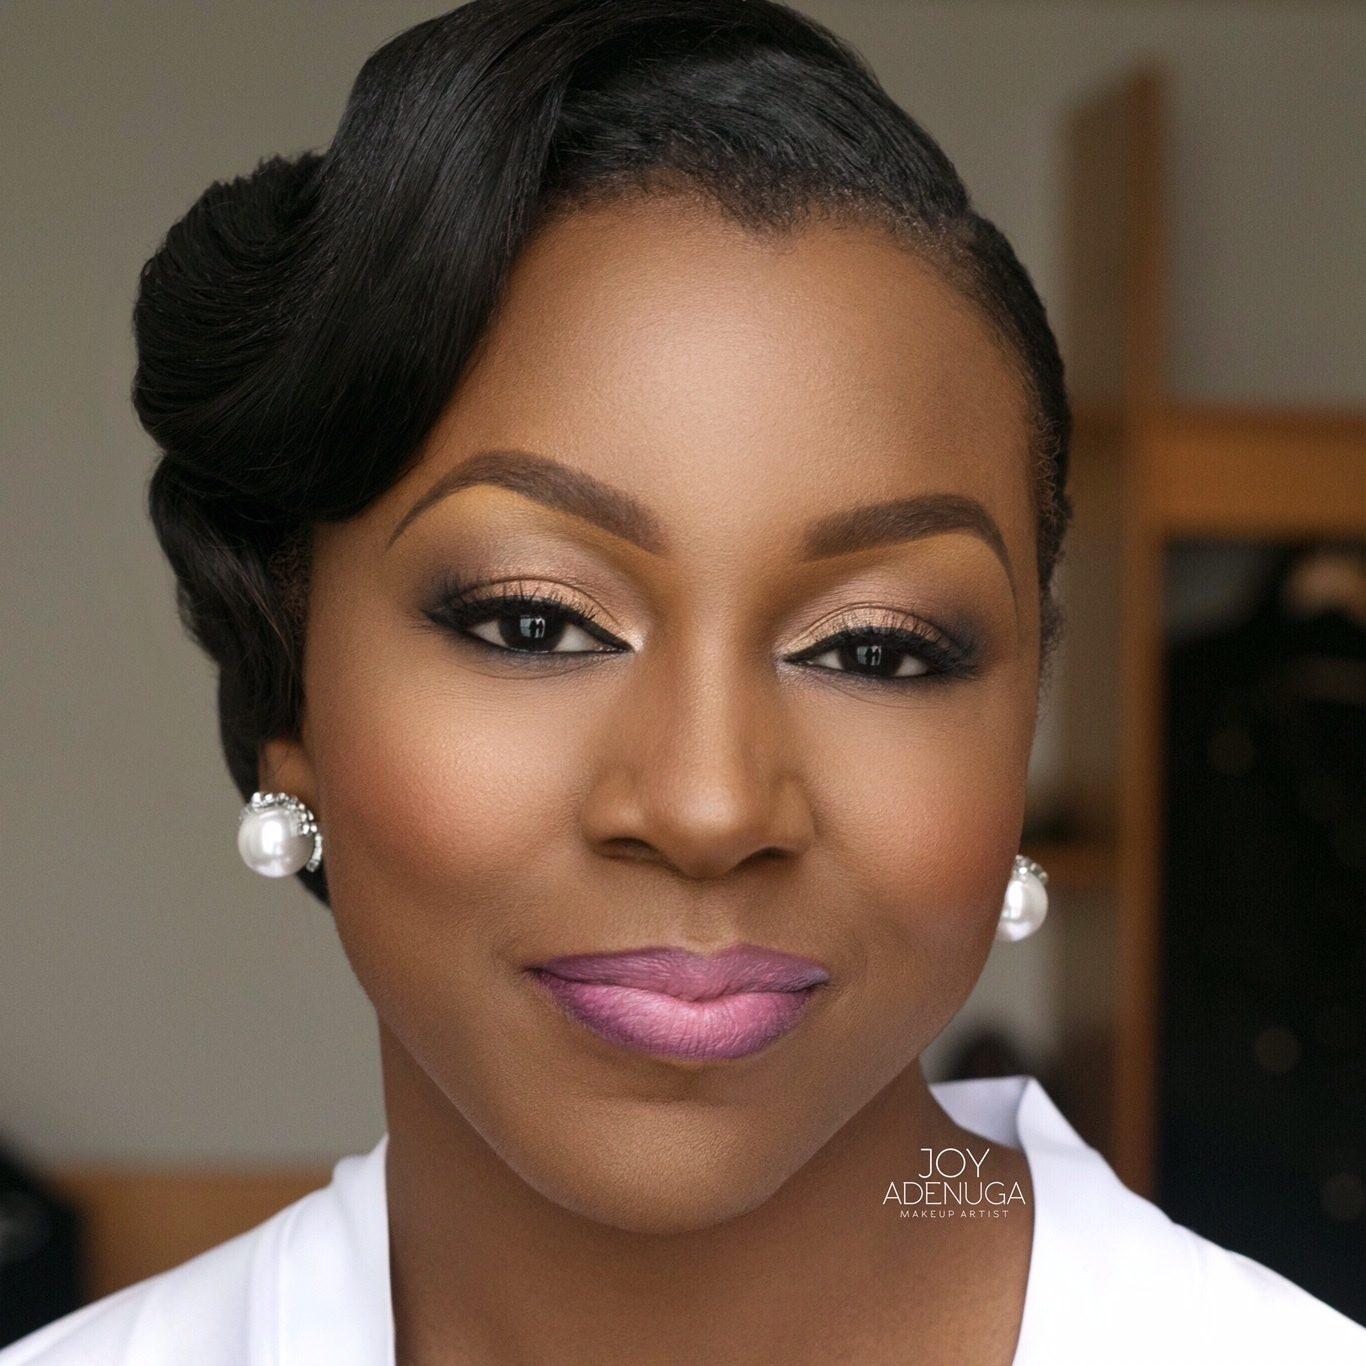 Bridal Makeup Tutorial For Dark Skin : Wedding Day Makeup For Black Brides - Mugeek Vidalondon